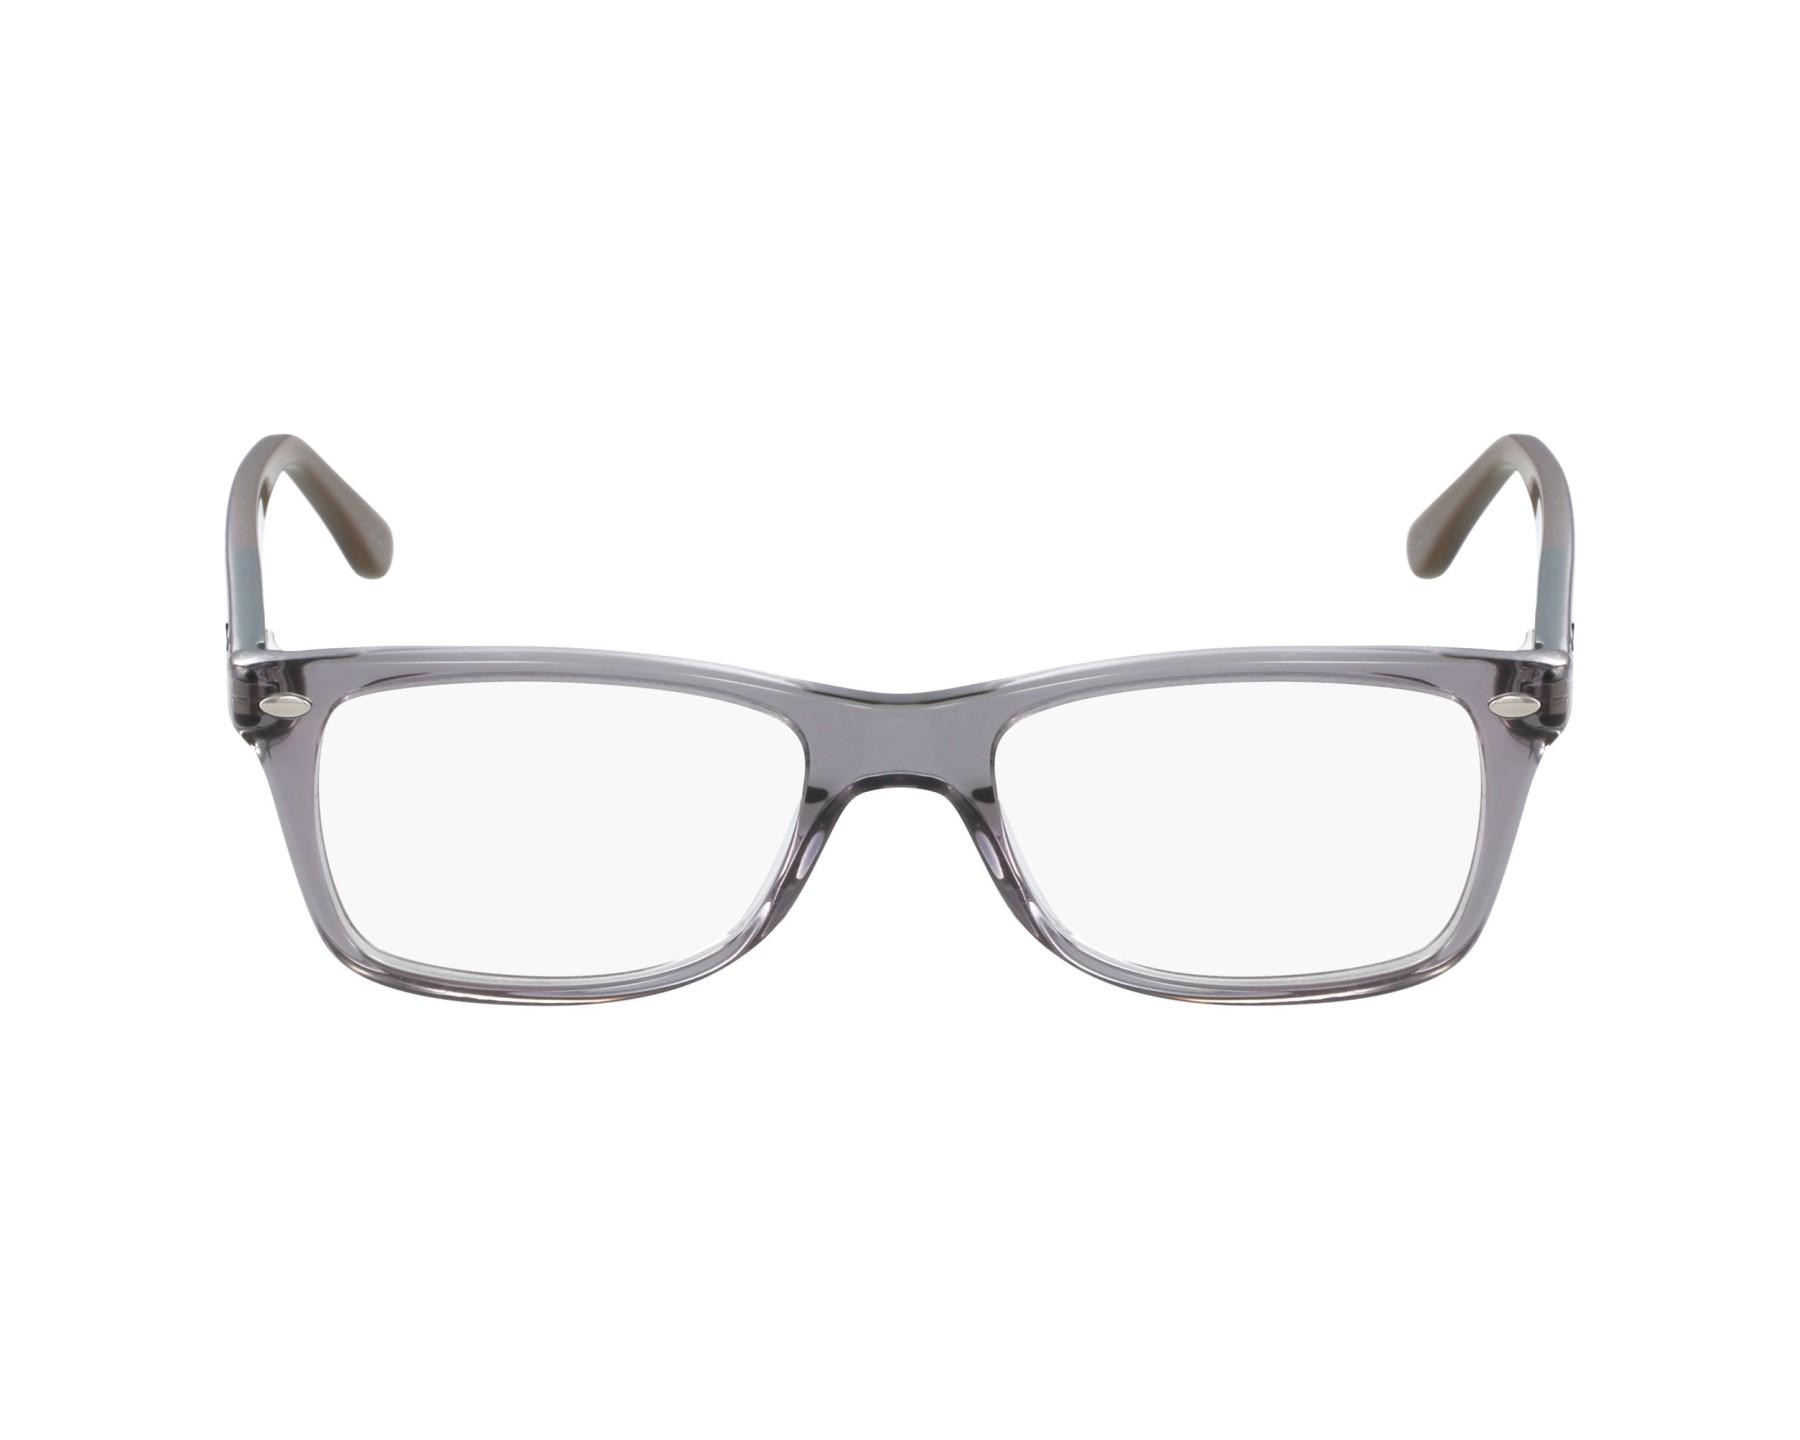 f532c8fc12d02 eyeglasses Ray-Ban RX-5228 5546 53-17 Grey Blue profile view